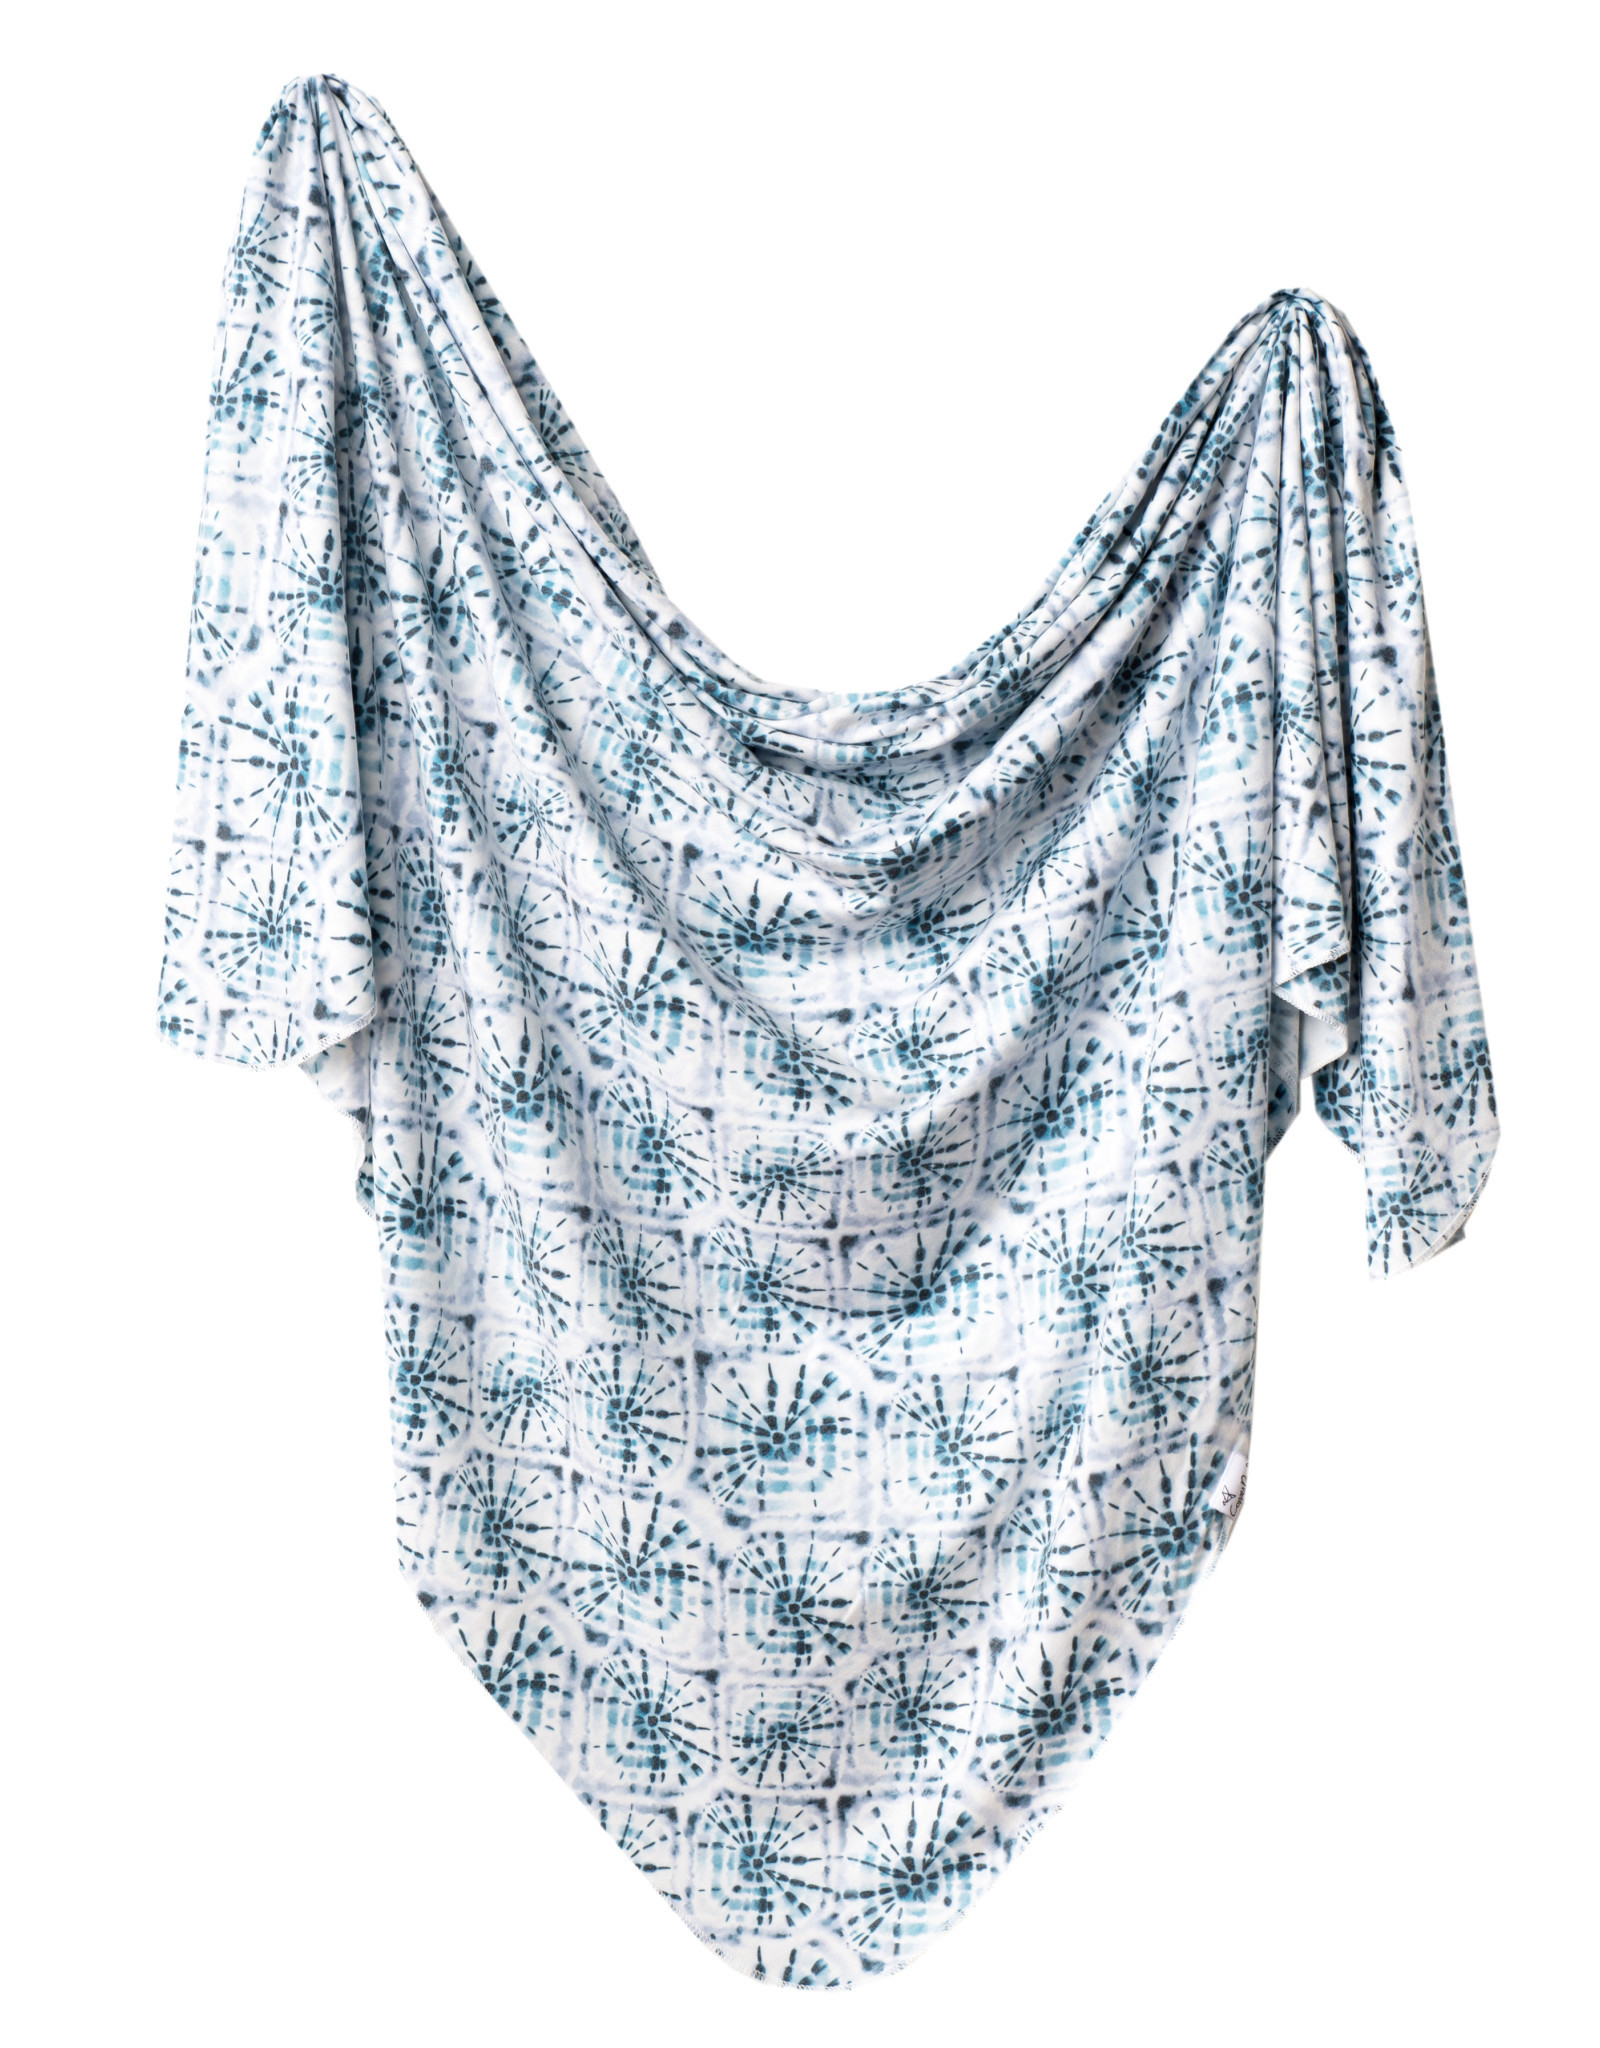 Copper Pearl Swaddle Blanket  Indigo